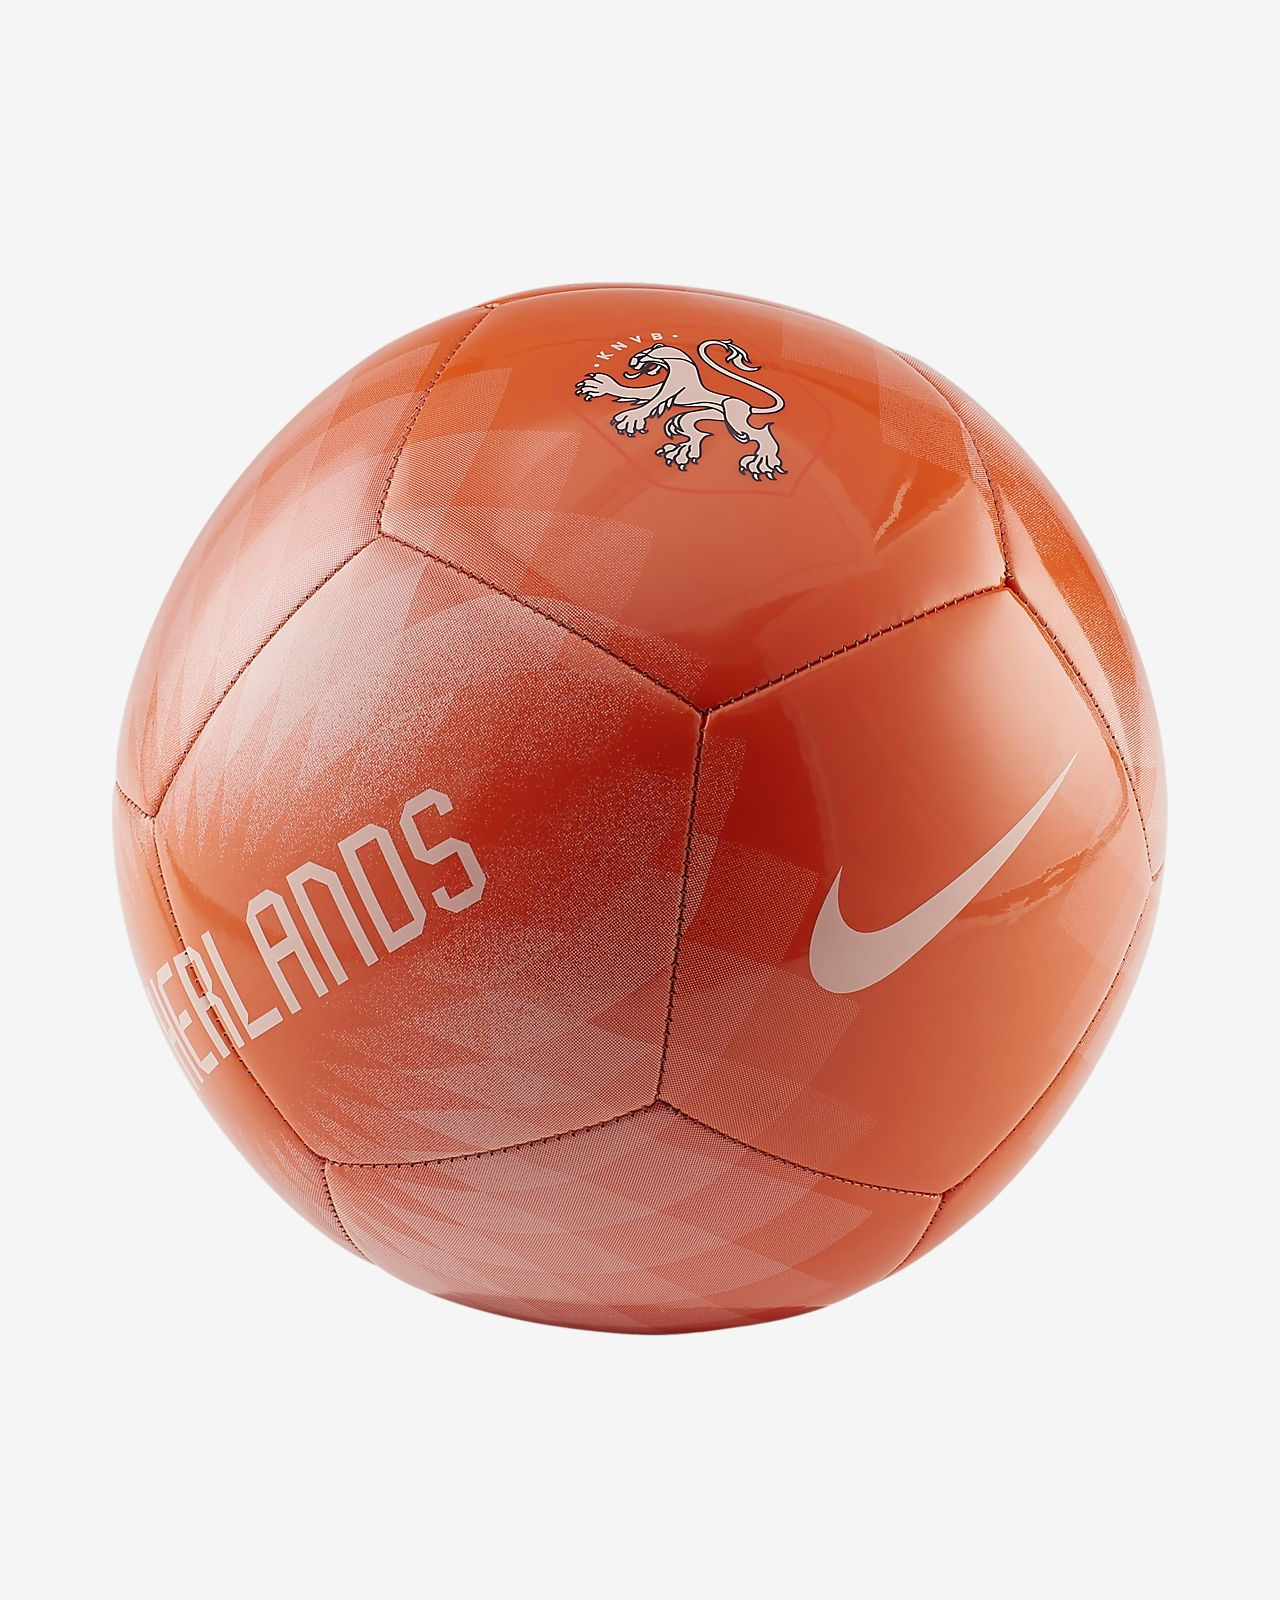 Fotboll Netherlands Pitch